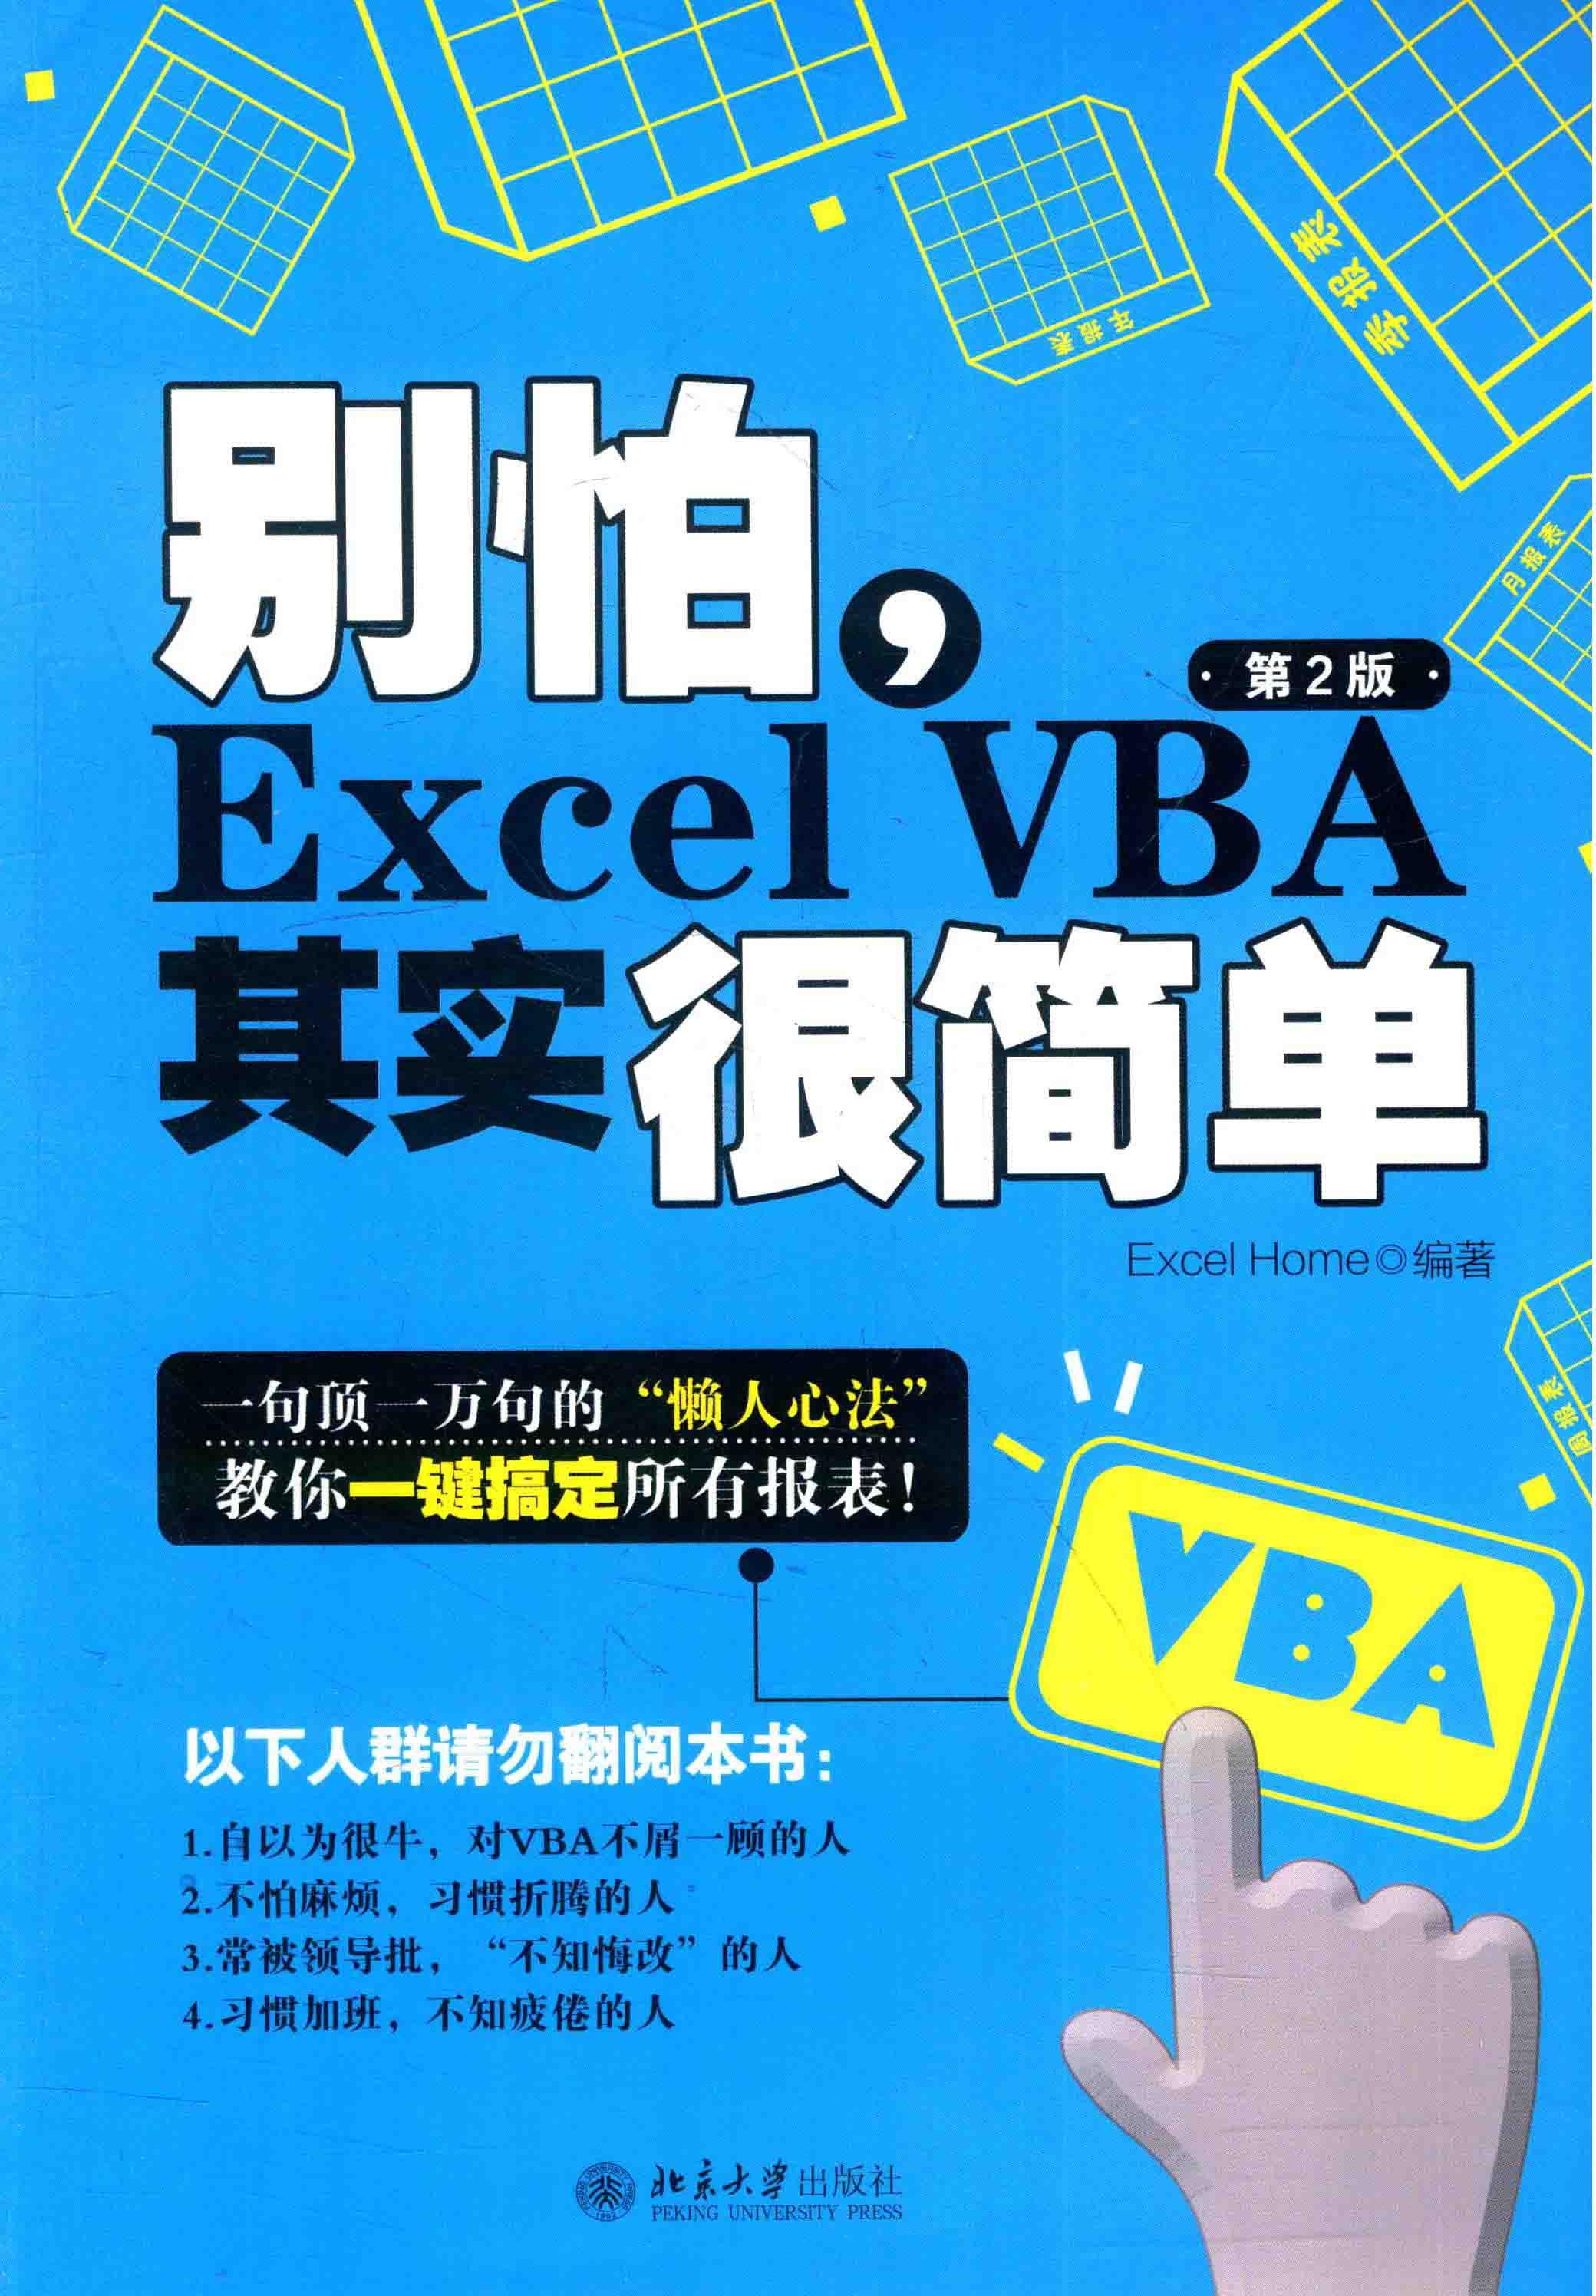 Book cover 别怕,Excel VBA 其实很简单(第2版)